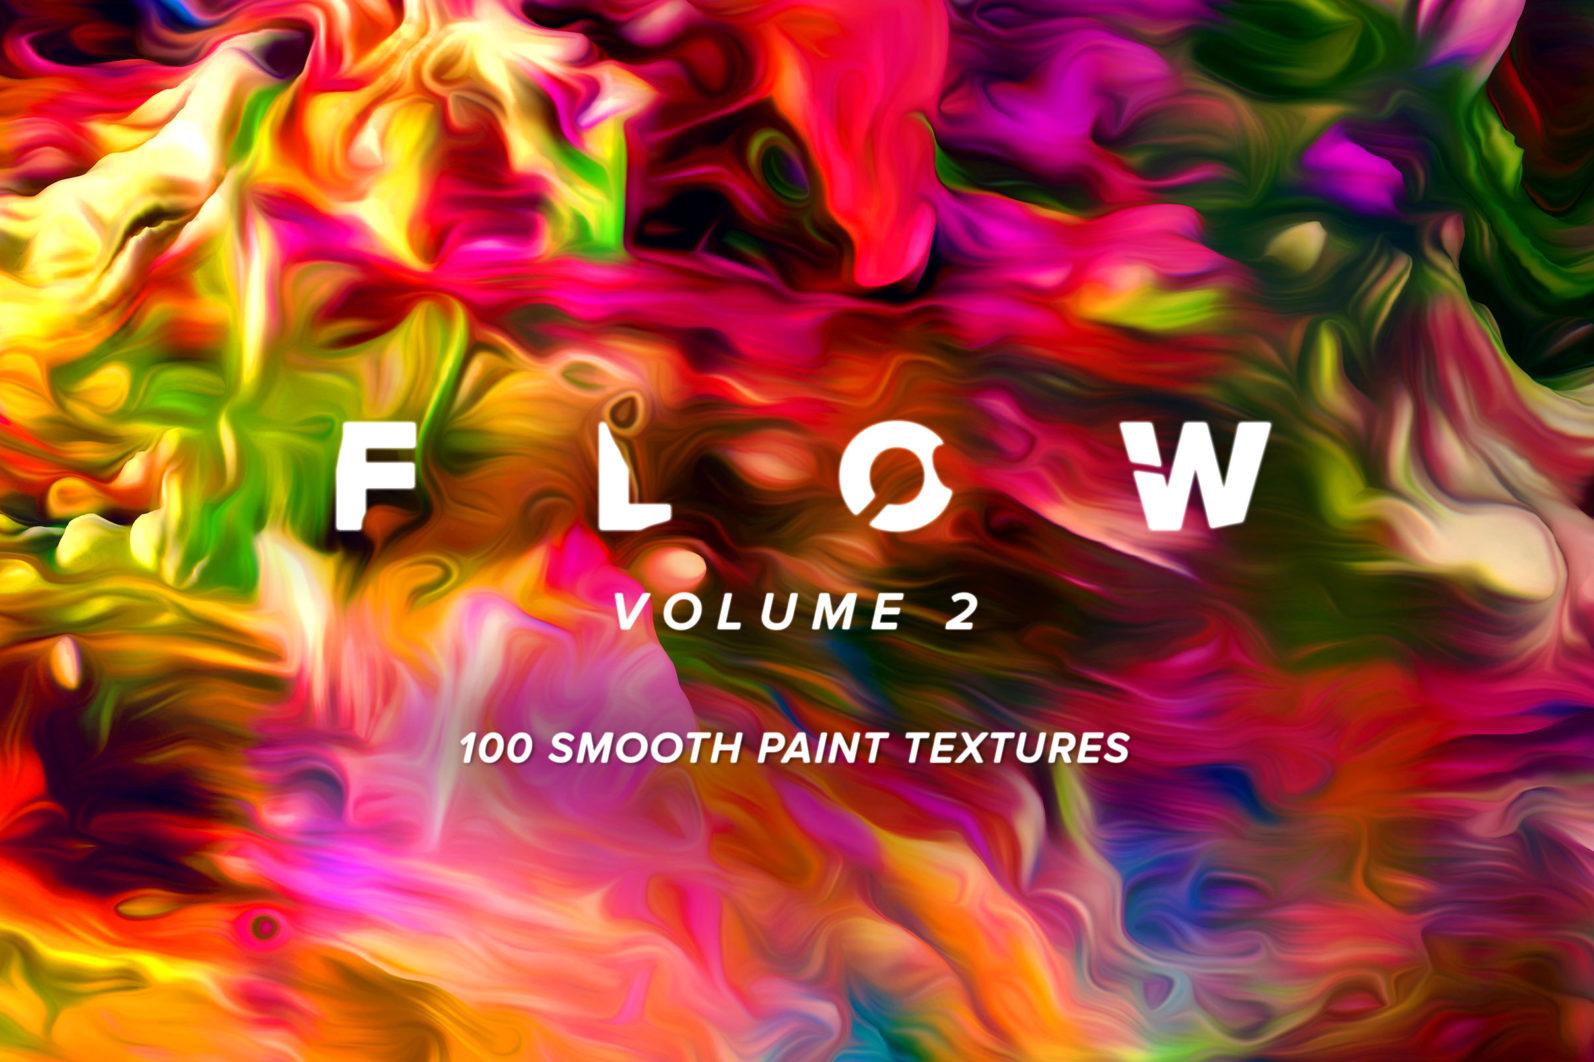 Flow, Vol. 2: 100 Smooth Paint Textures - Flow Vol 2 Preview 01 -